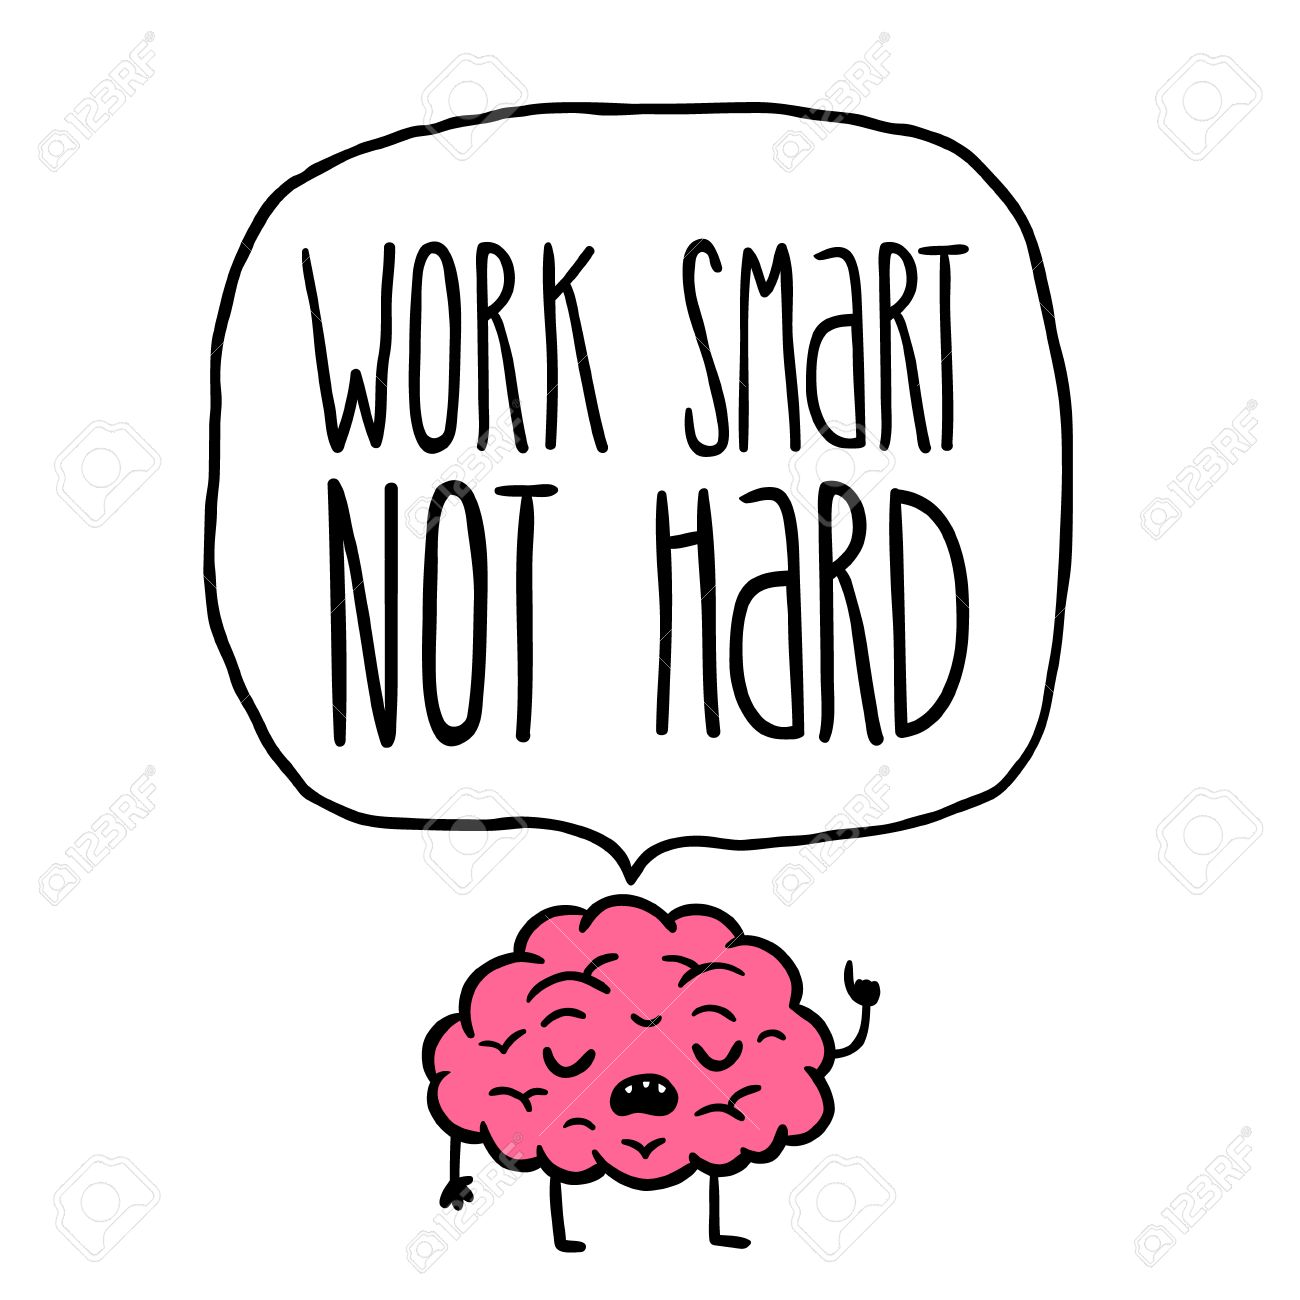 Work Smart Not Hard Vector Illustration. Brain Cartoon Royalty ... for Smart Cartoon Brain  56mzq